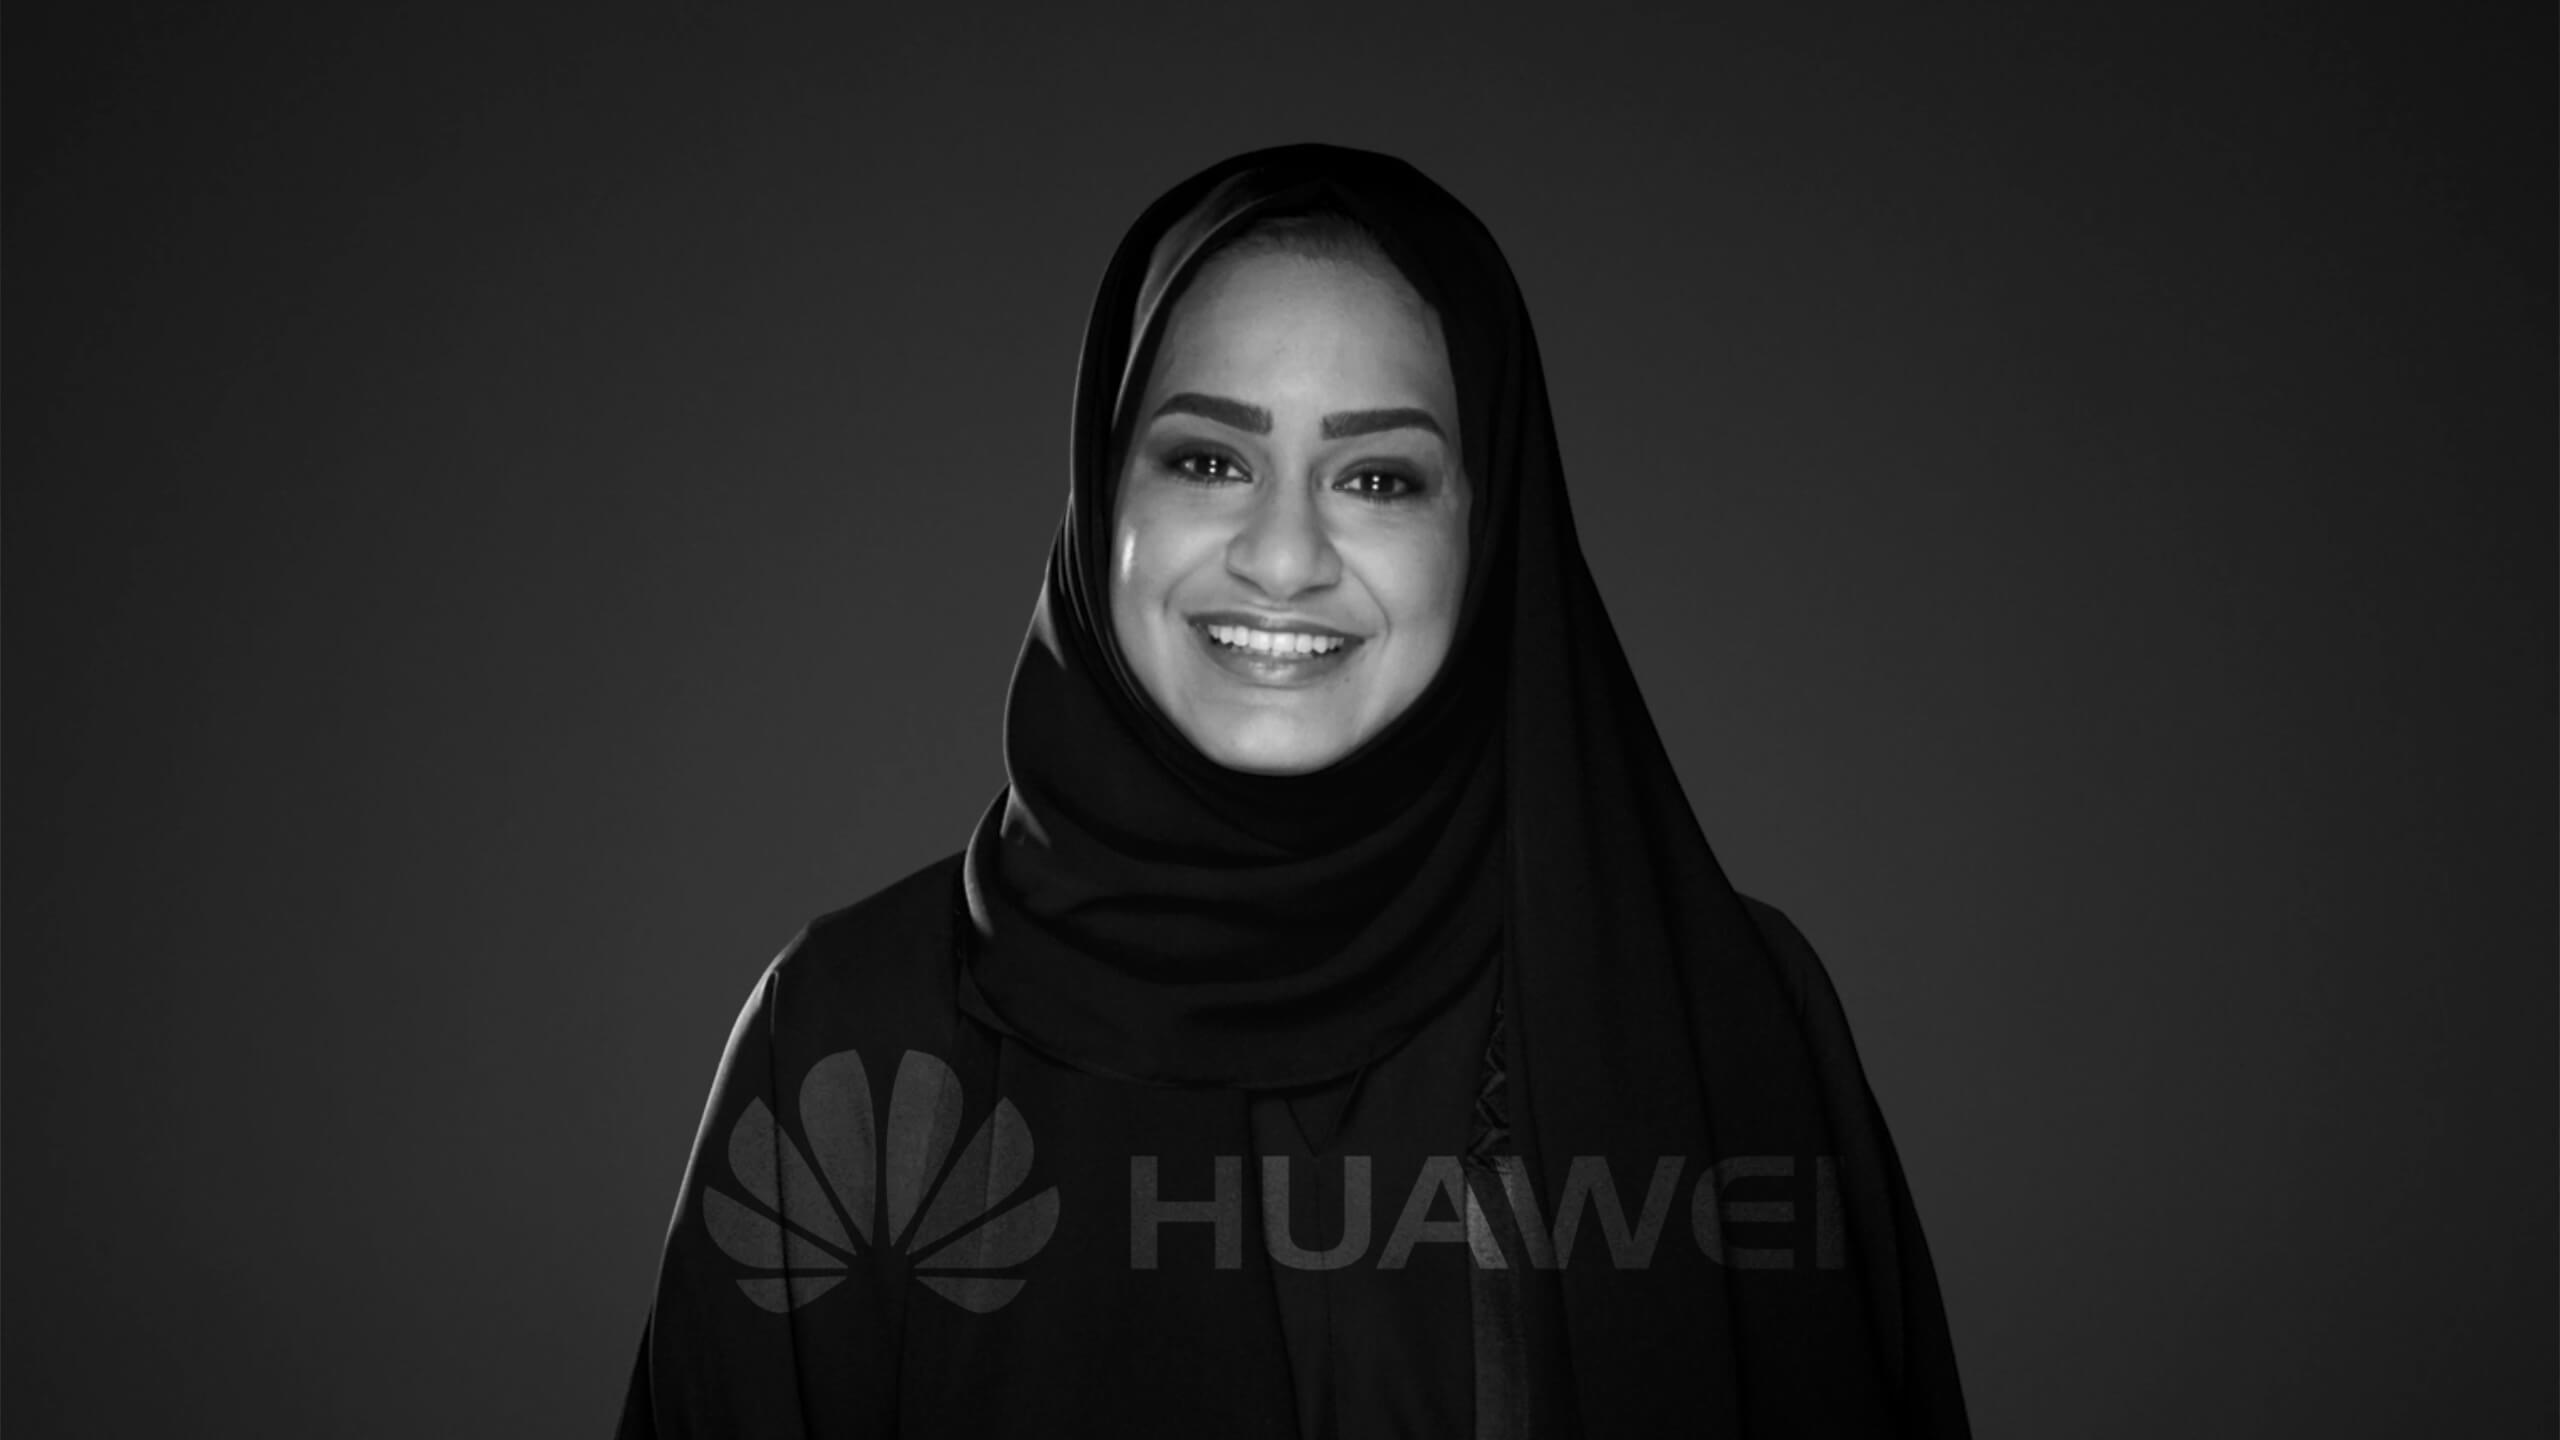 Who is Huawei